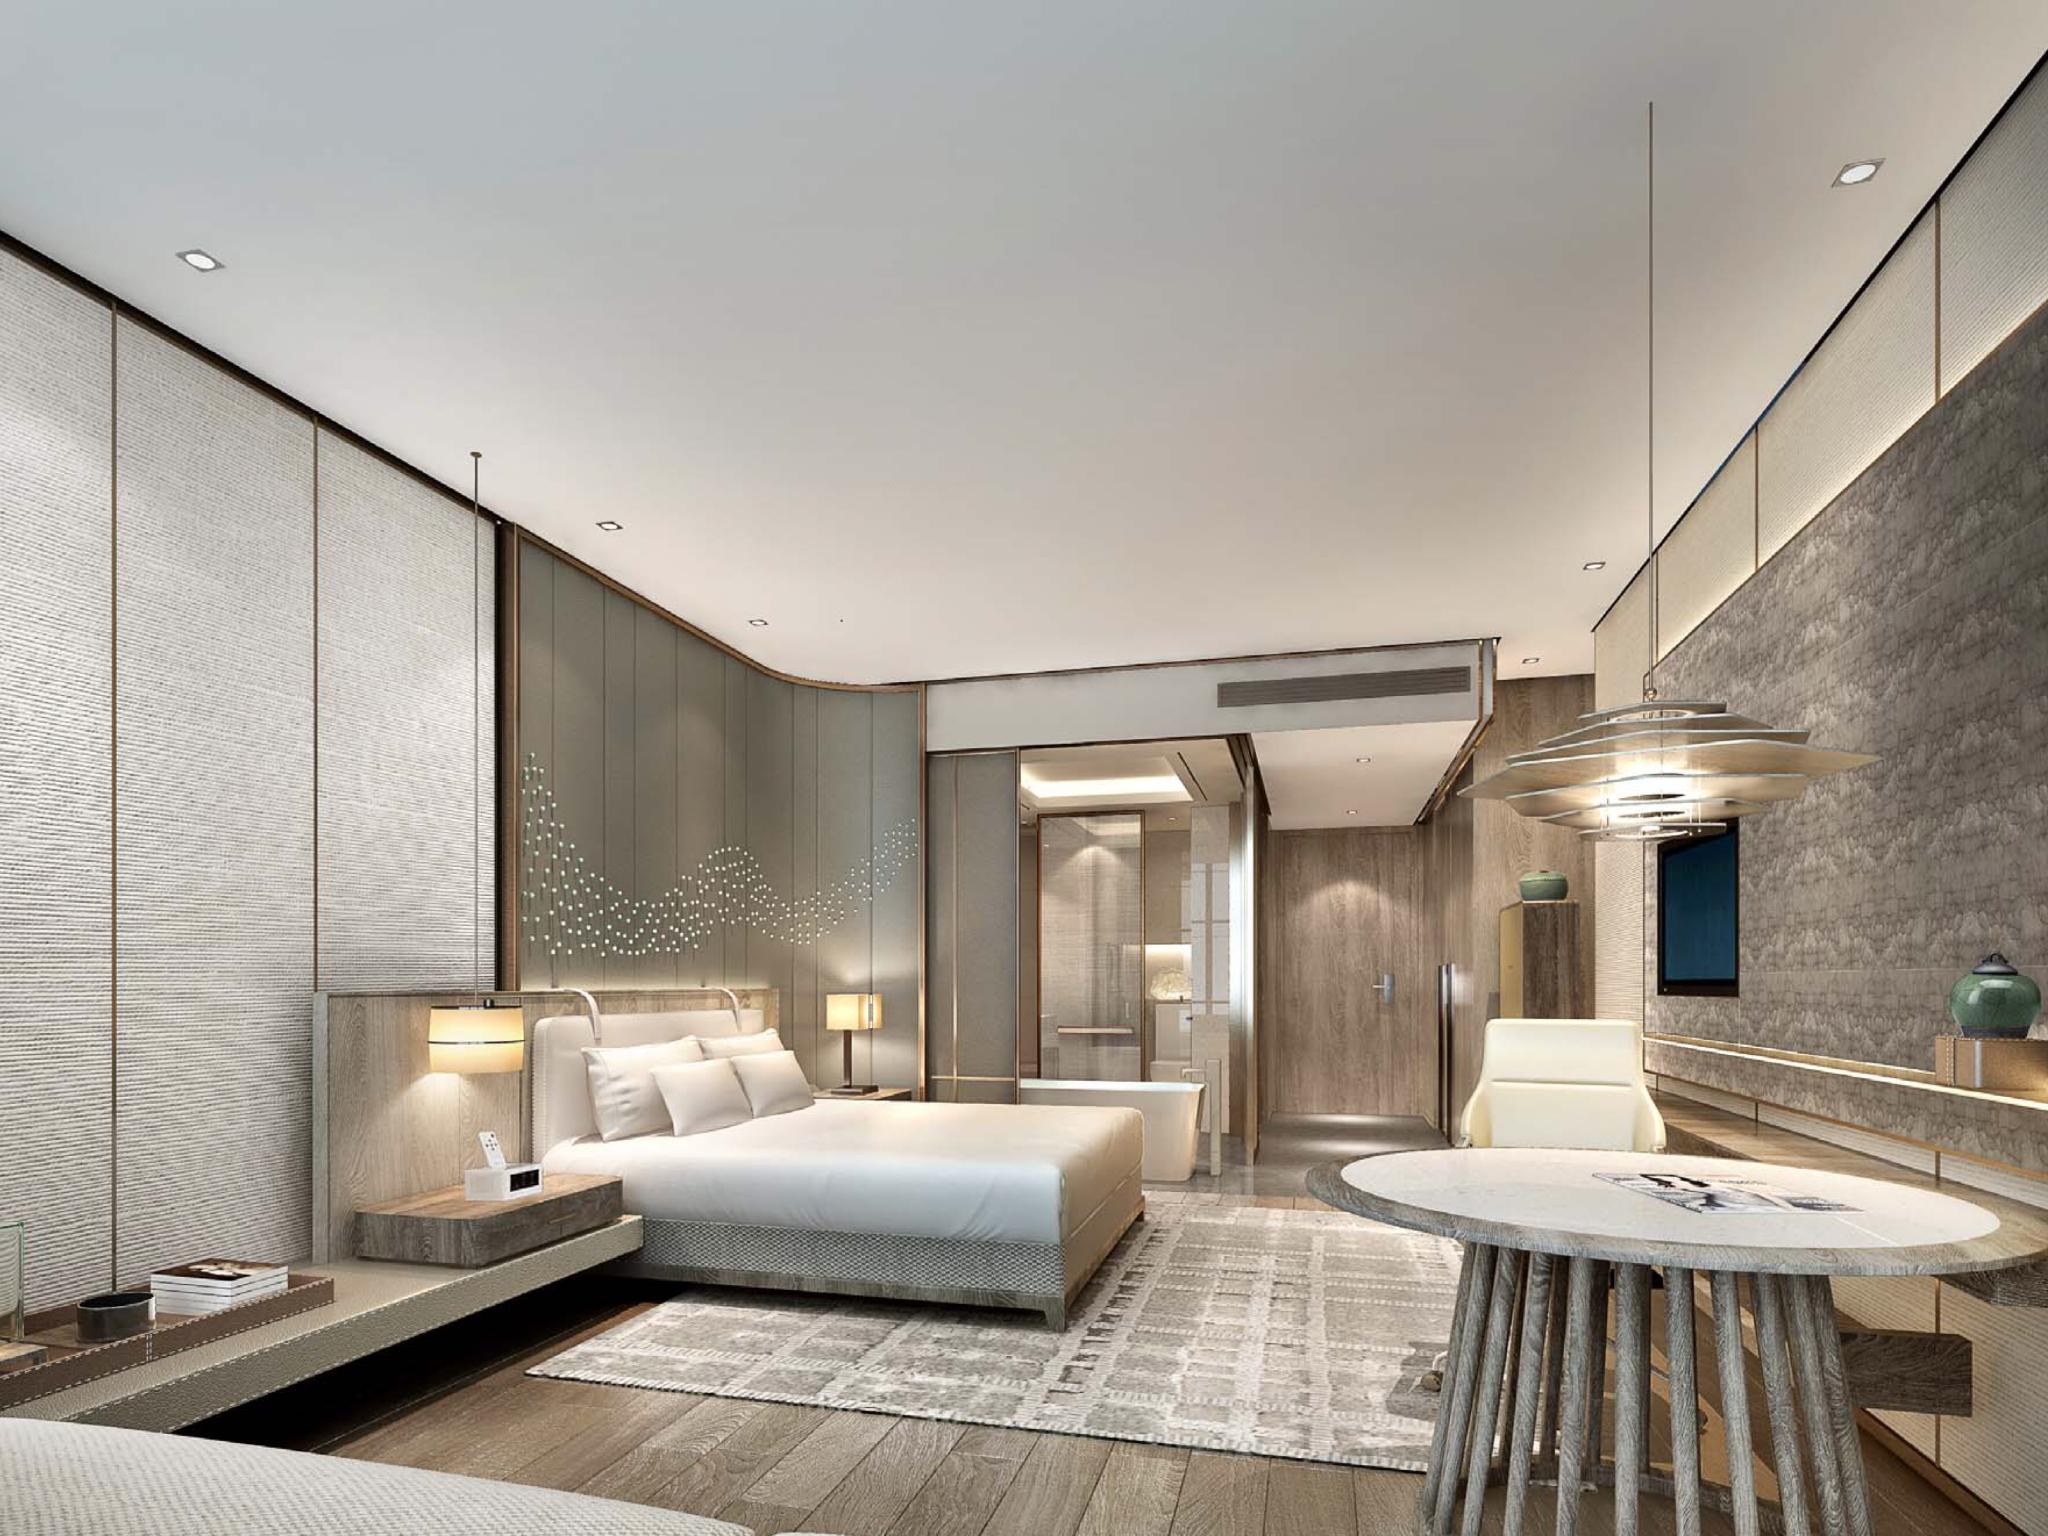 moderne hauptschlafzimmer designs decor hotelzimmer luxuriöse schlafzimmer hauptschlafzimmer schlafzimmerdecke schlafzimmerdeko moderne hotelzimmer design pin by mezing on bedroom卧室 pinterest bett and wohnen